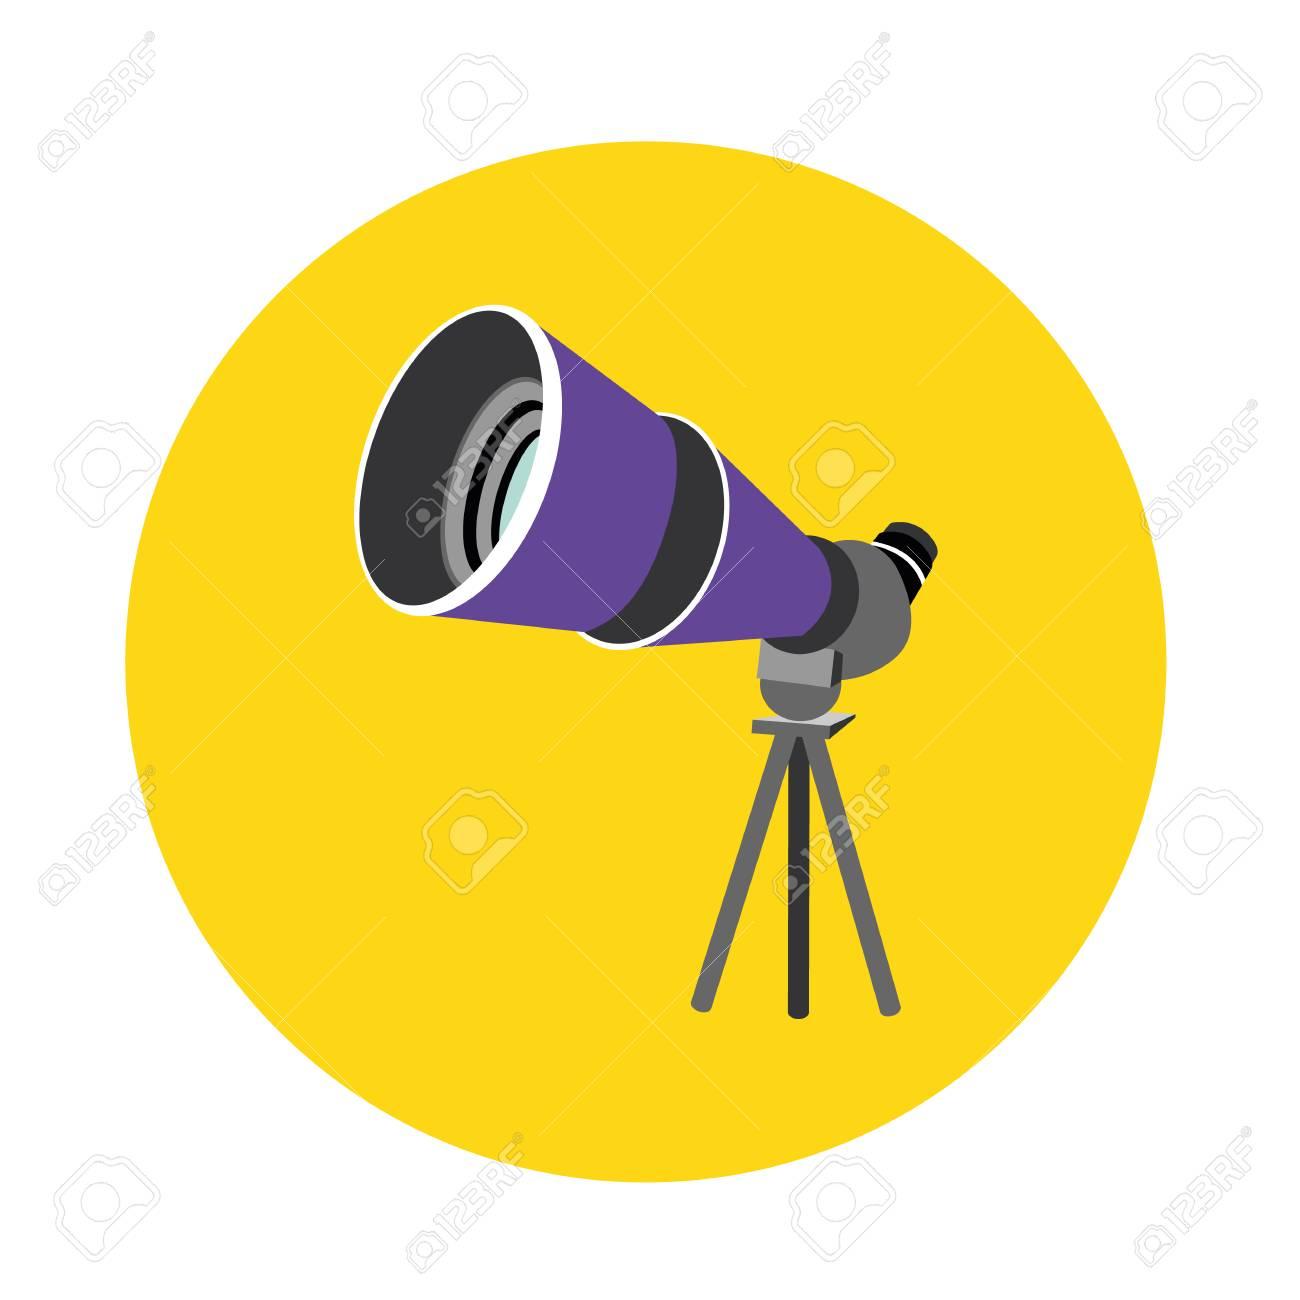 Birdwatching travel scope icon isolated on yellow background